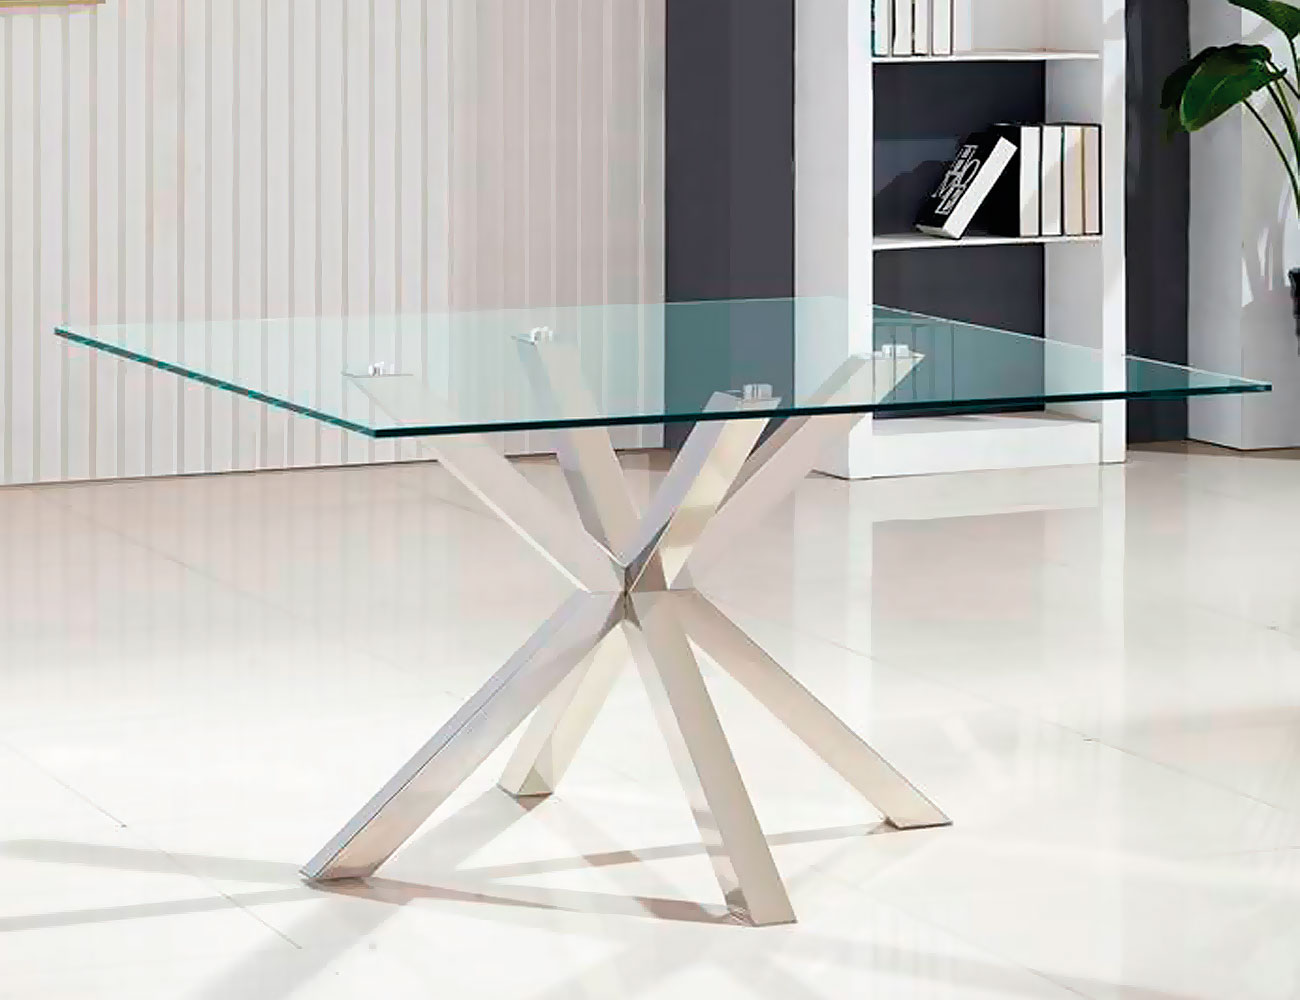 Mesa de comedor de cristal templado cuadrada de 140 cm for Comedor de cristal